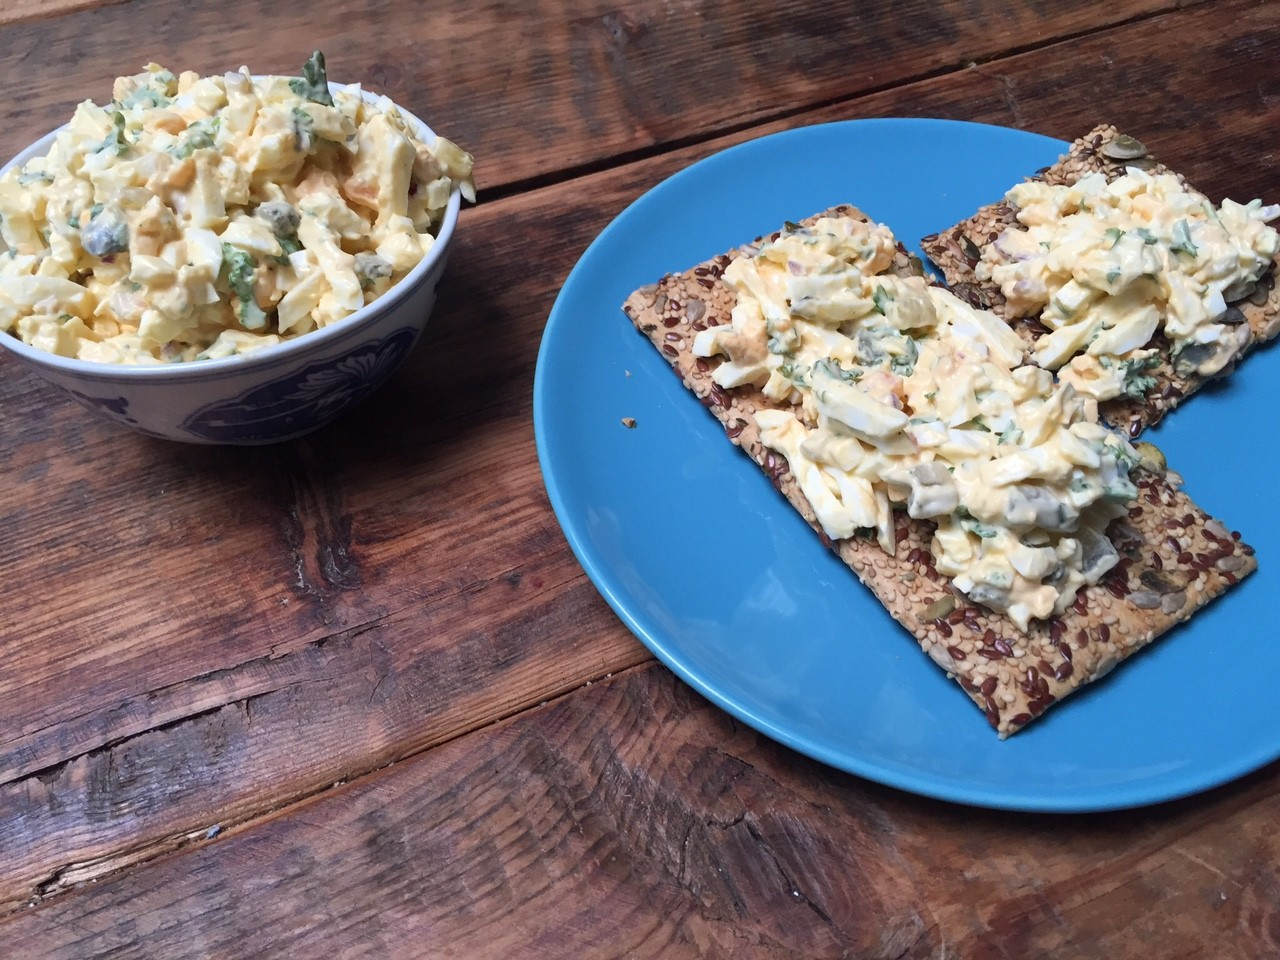 Frisse eiersalade recept van veggie very much kookboek foodblog Foodinista